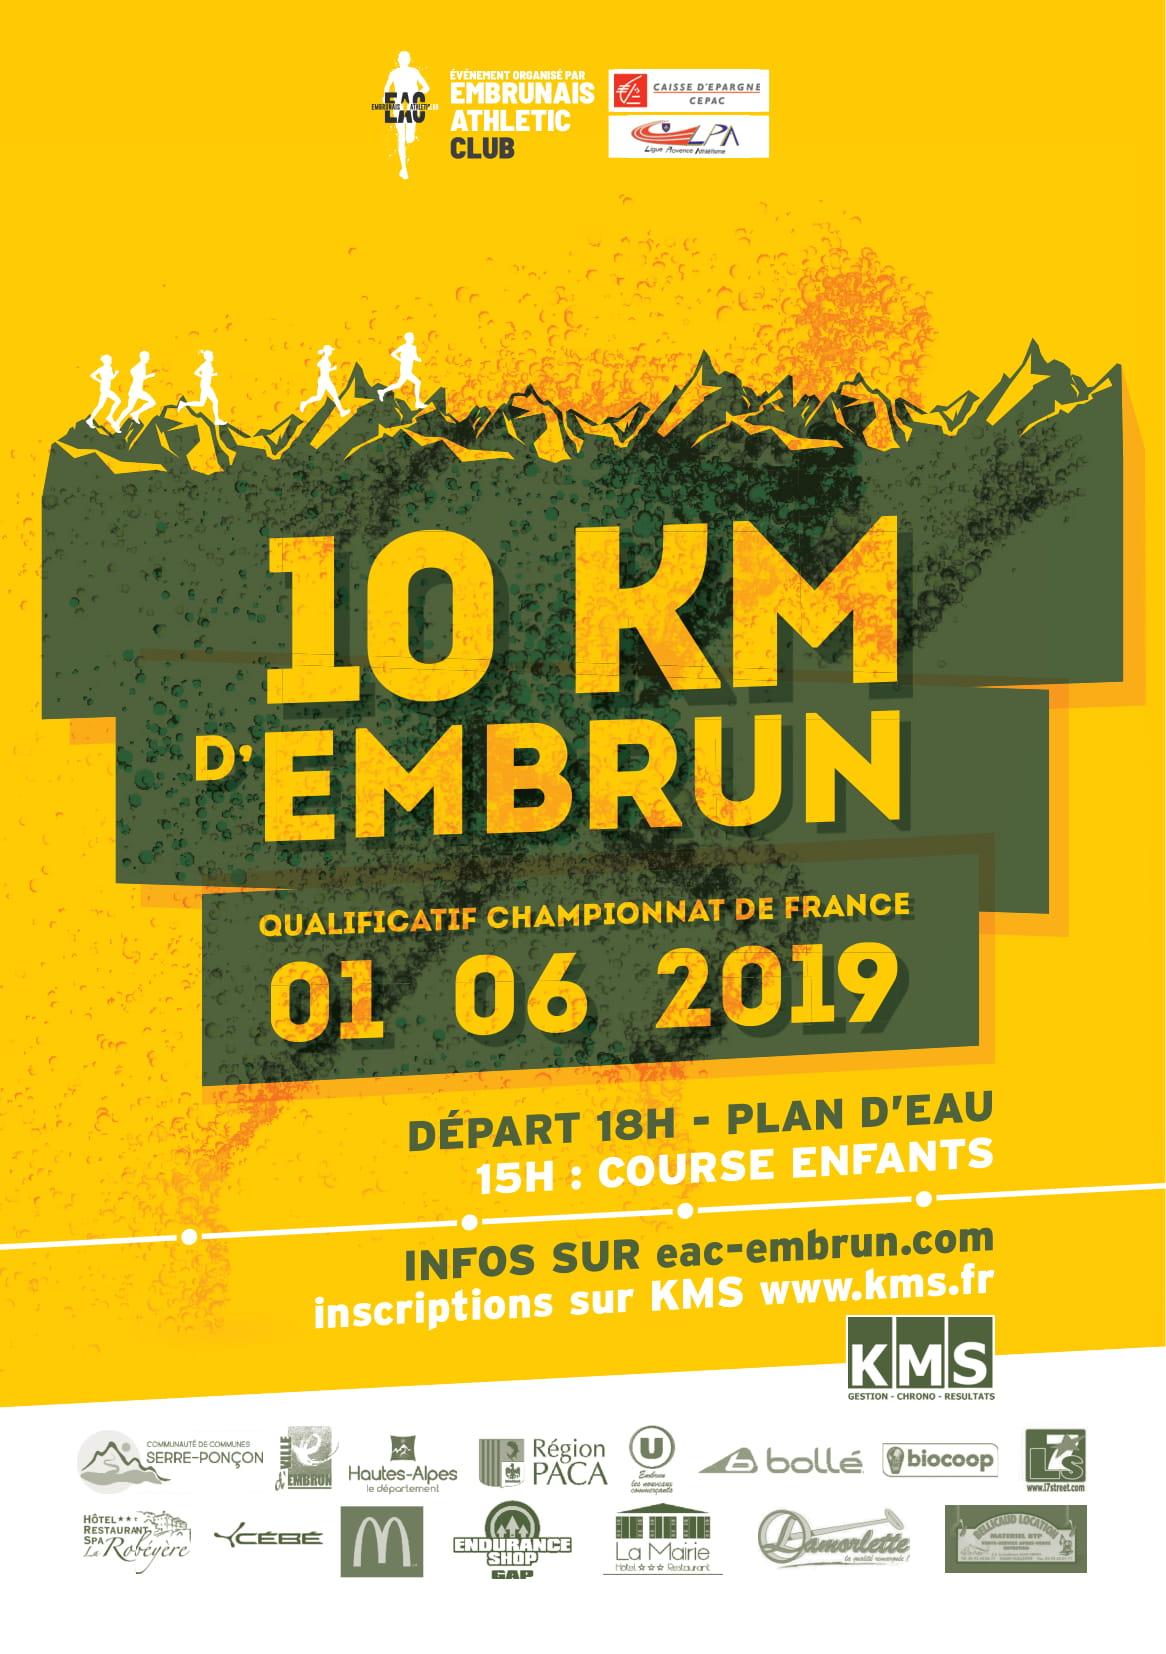 10 km Embrun - Challenge equipe trio